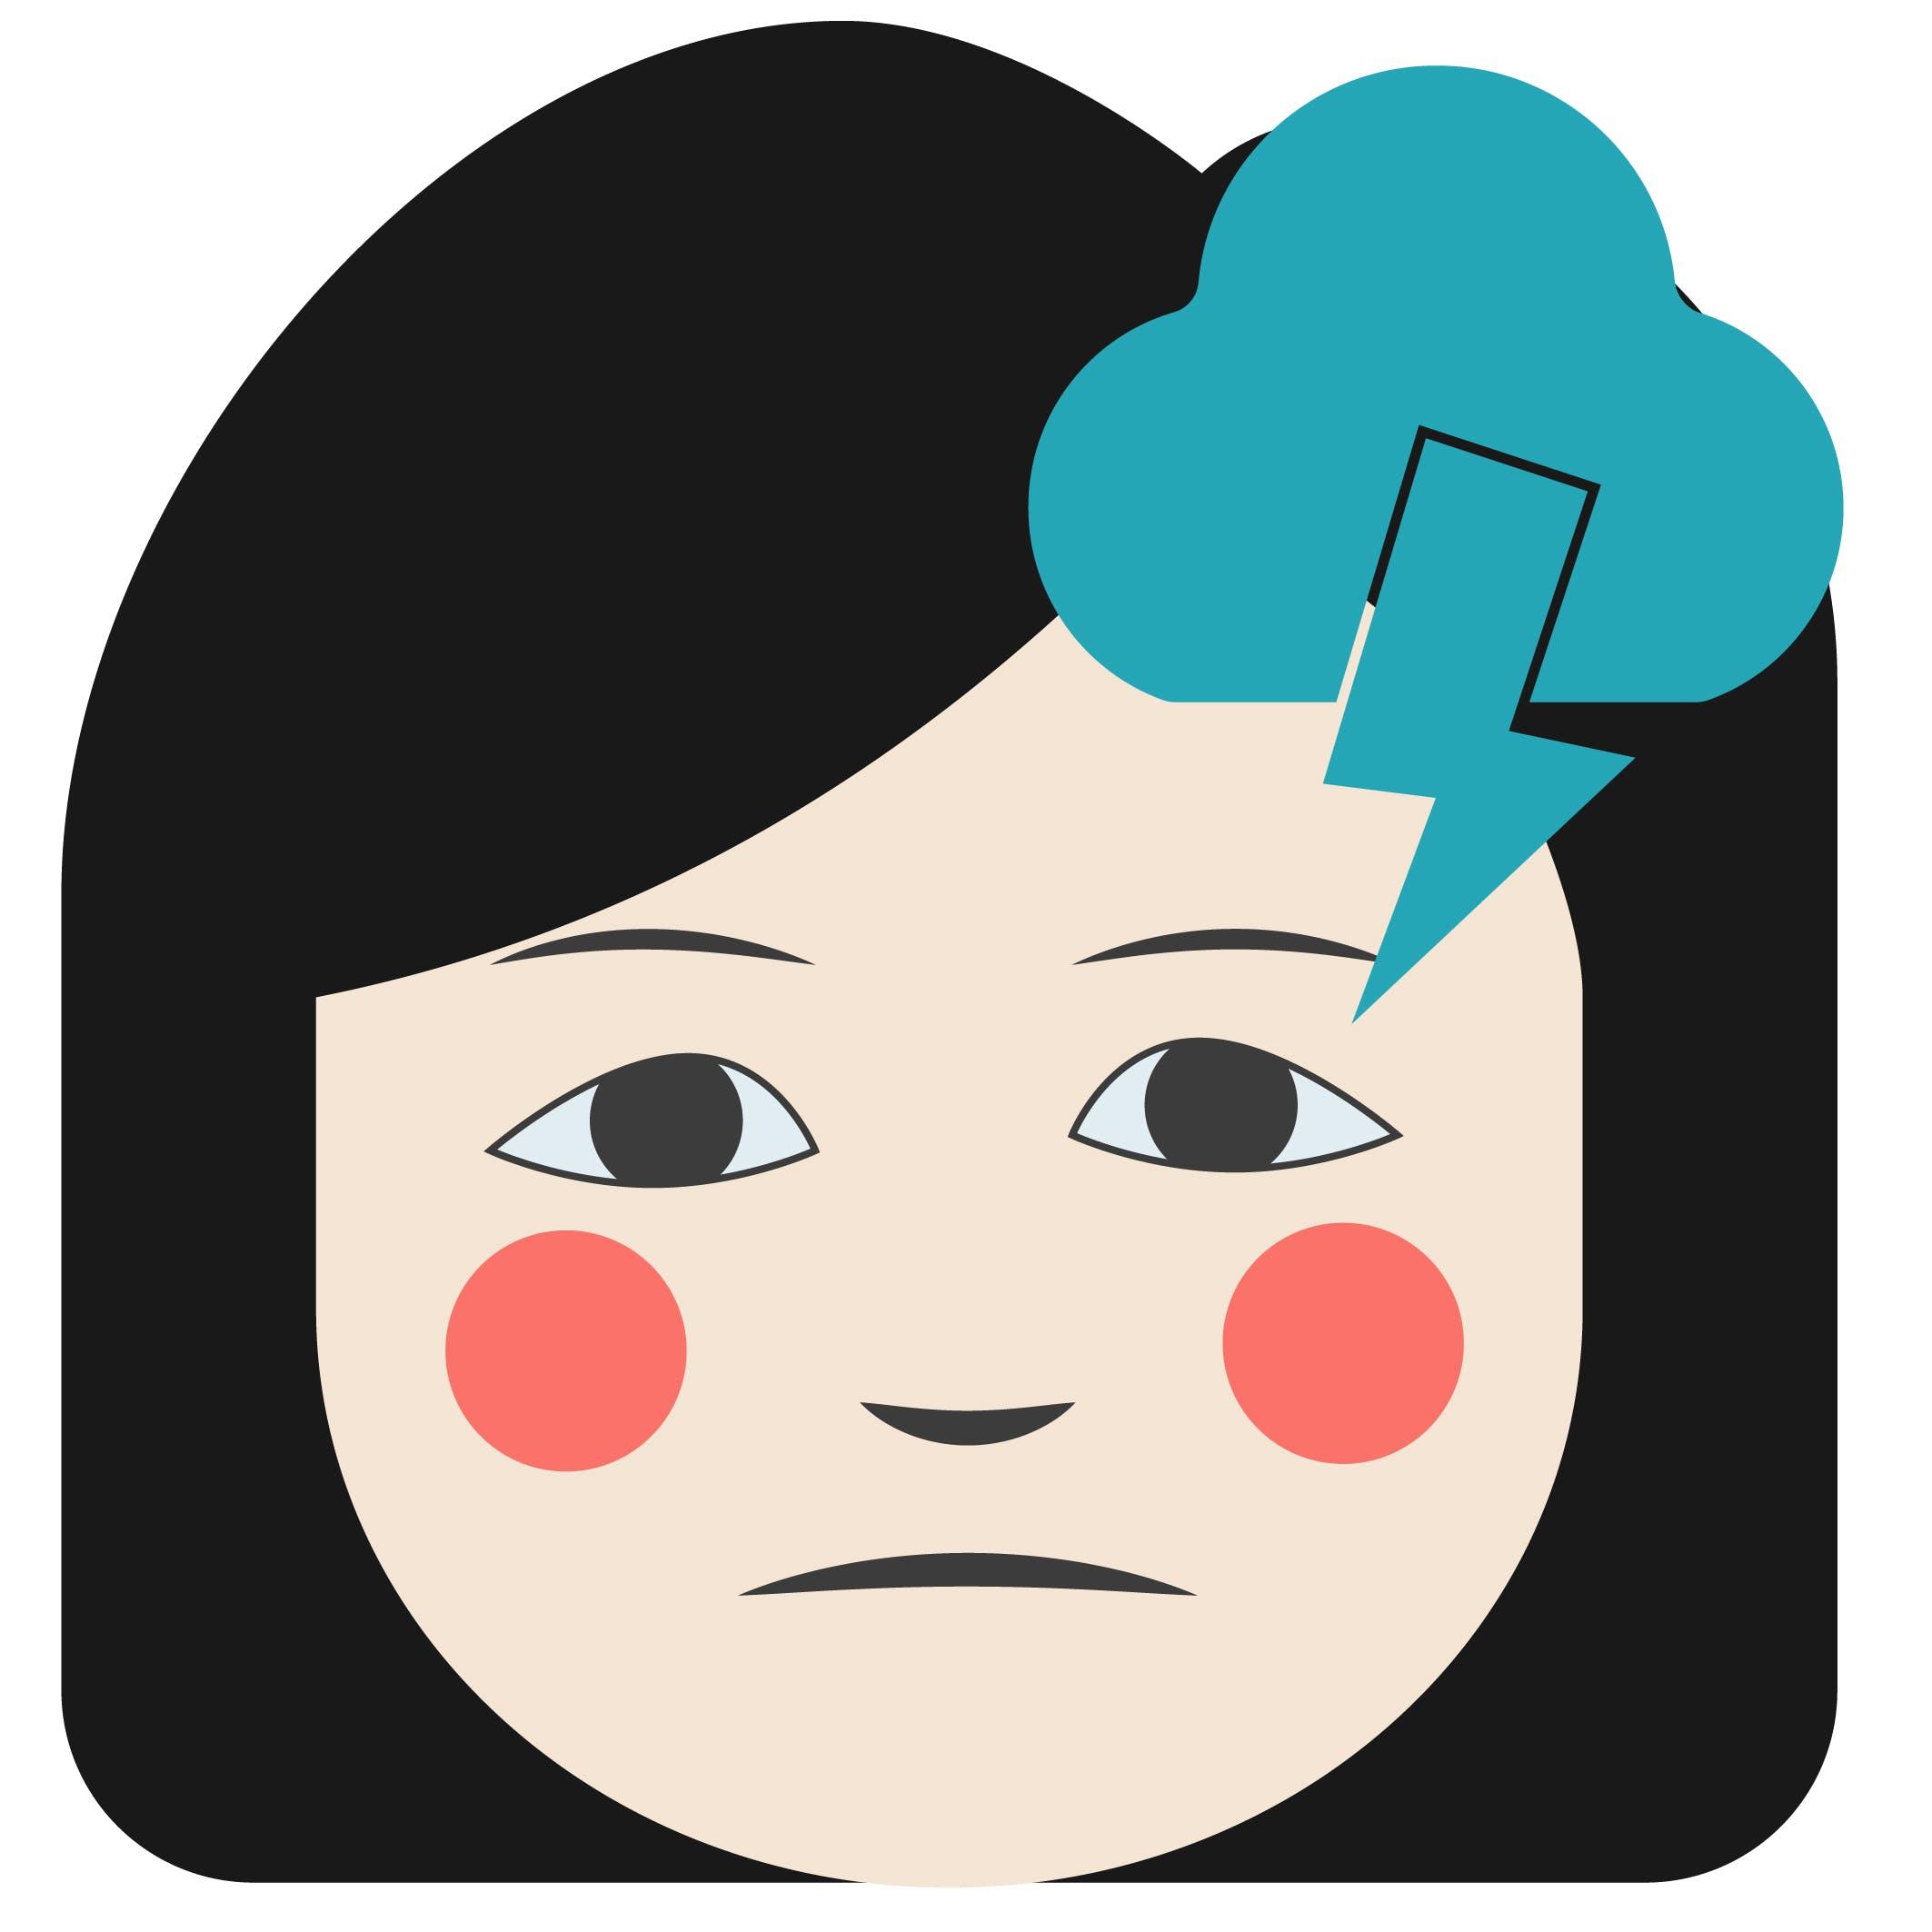 Icon mögliche Lupus Ursache Stress